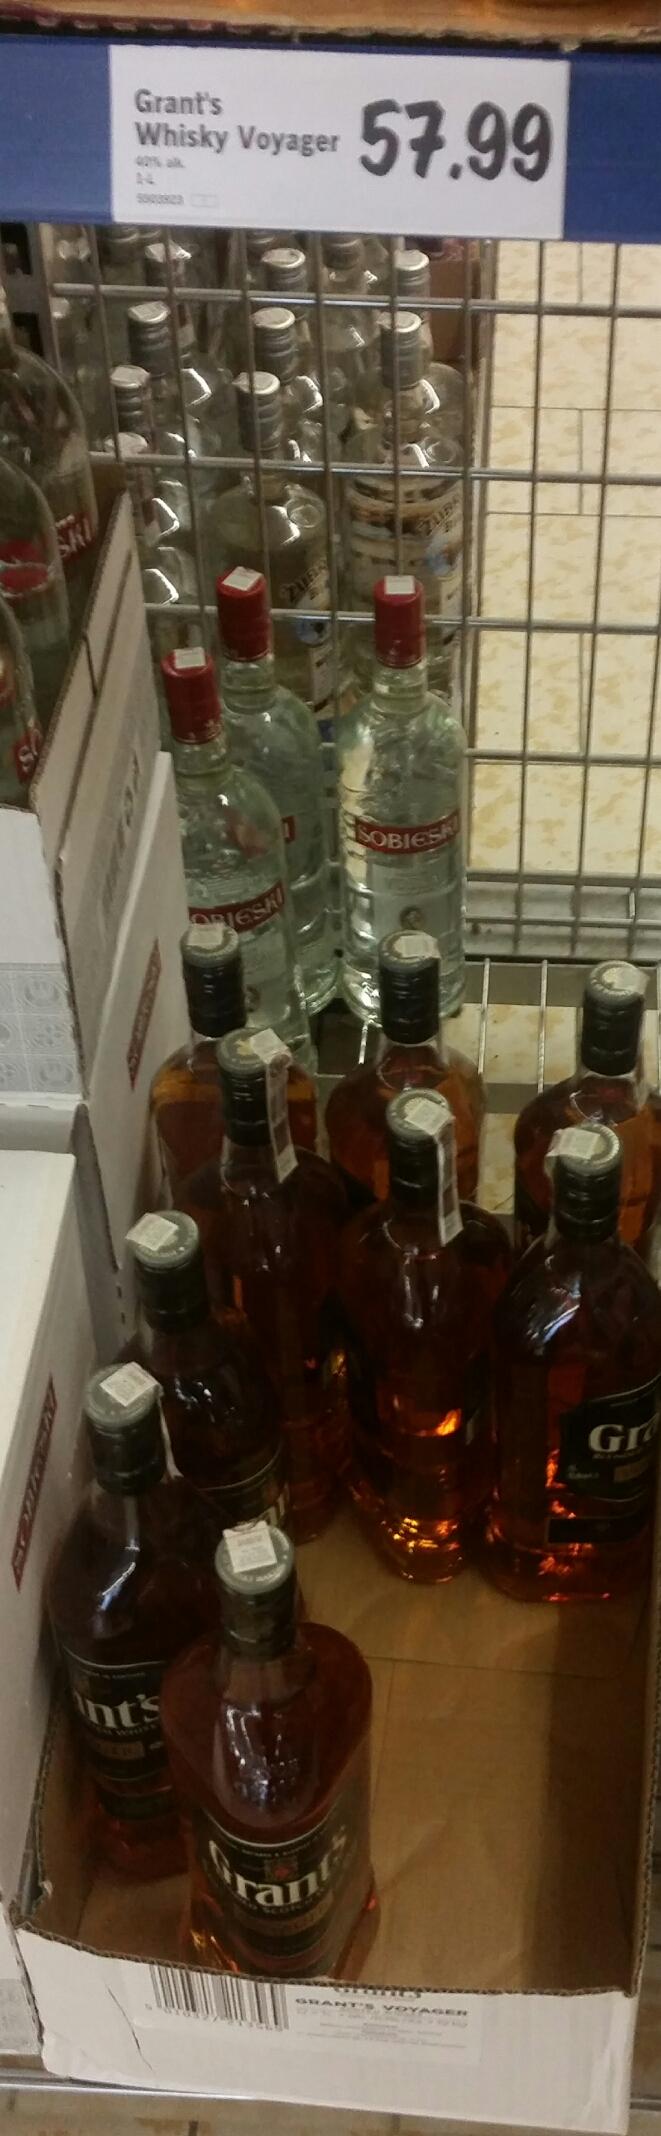 Whisky Grant's Voyager (czarny) 1L za 57.99zł w Lidlu